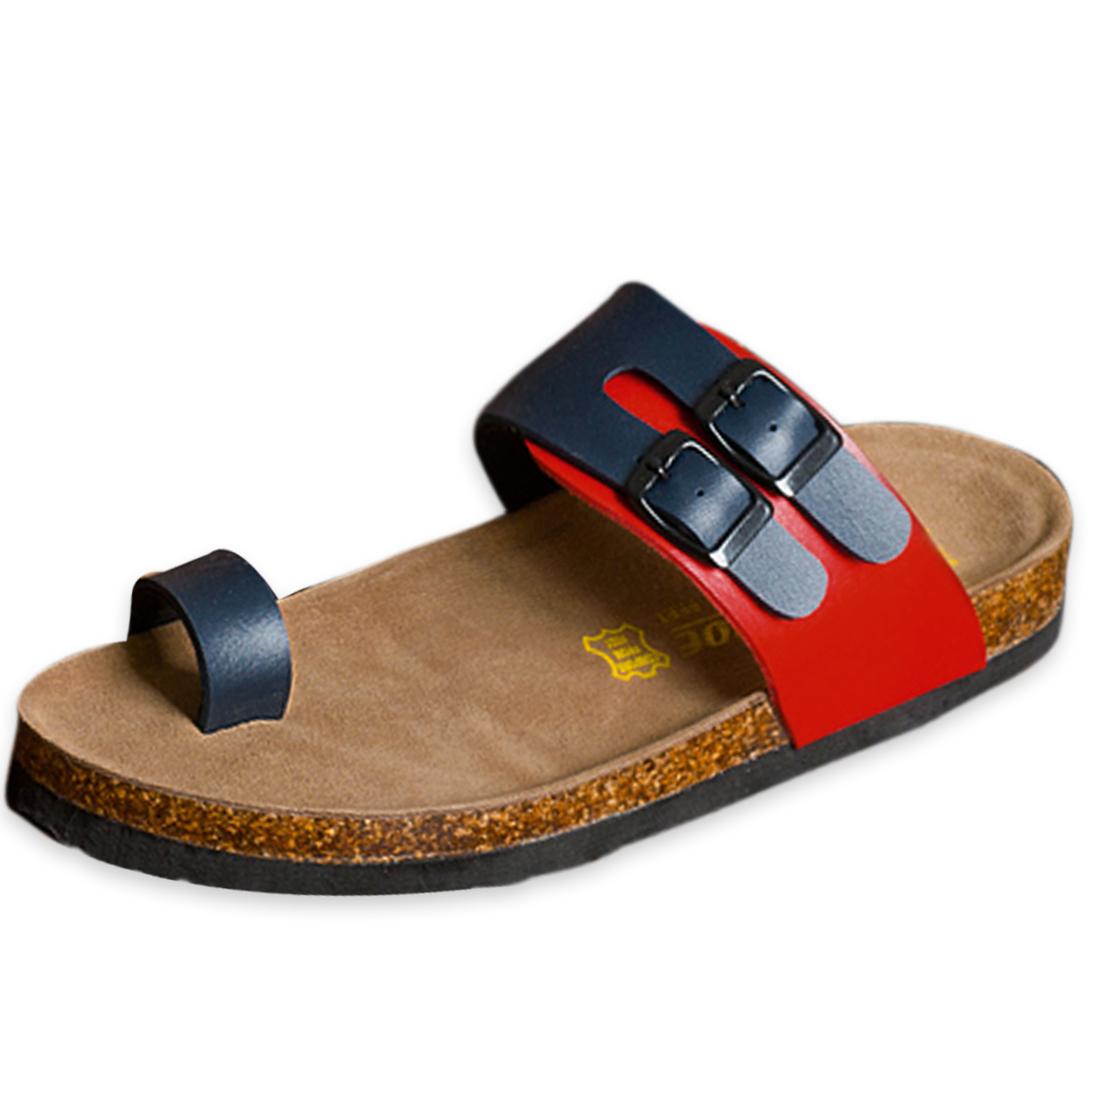 Deep Heel Cup Toe Loop Men Stylish Flip Flop Blue Red US Size 6.5